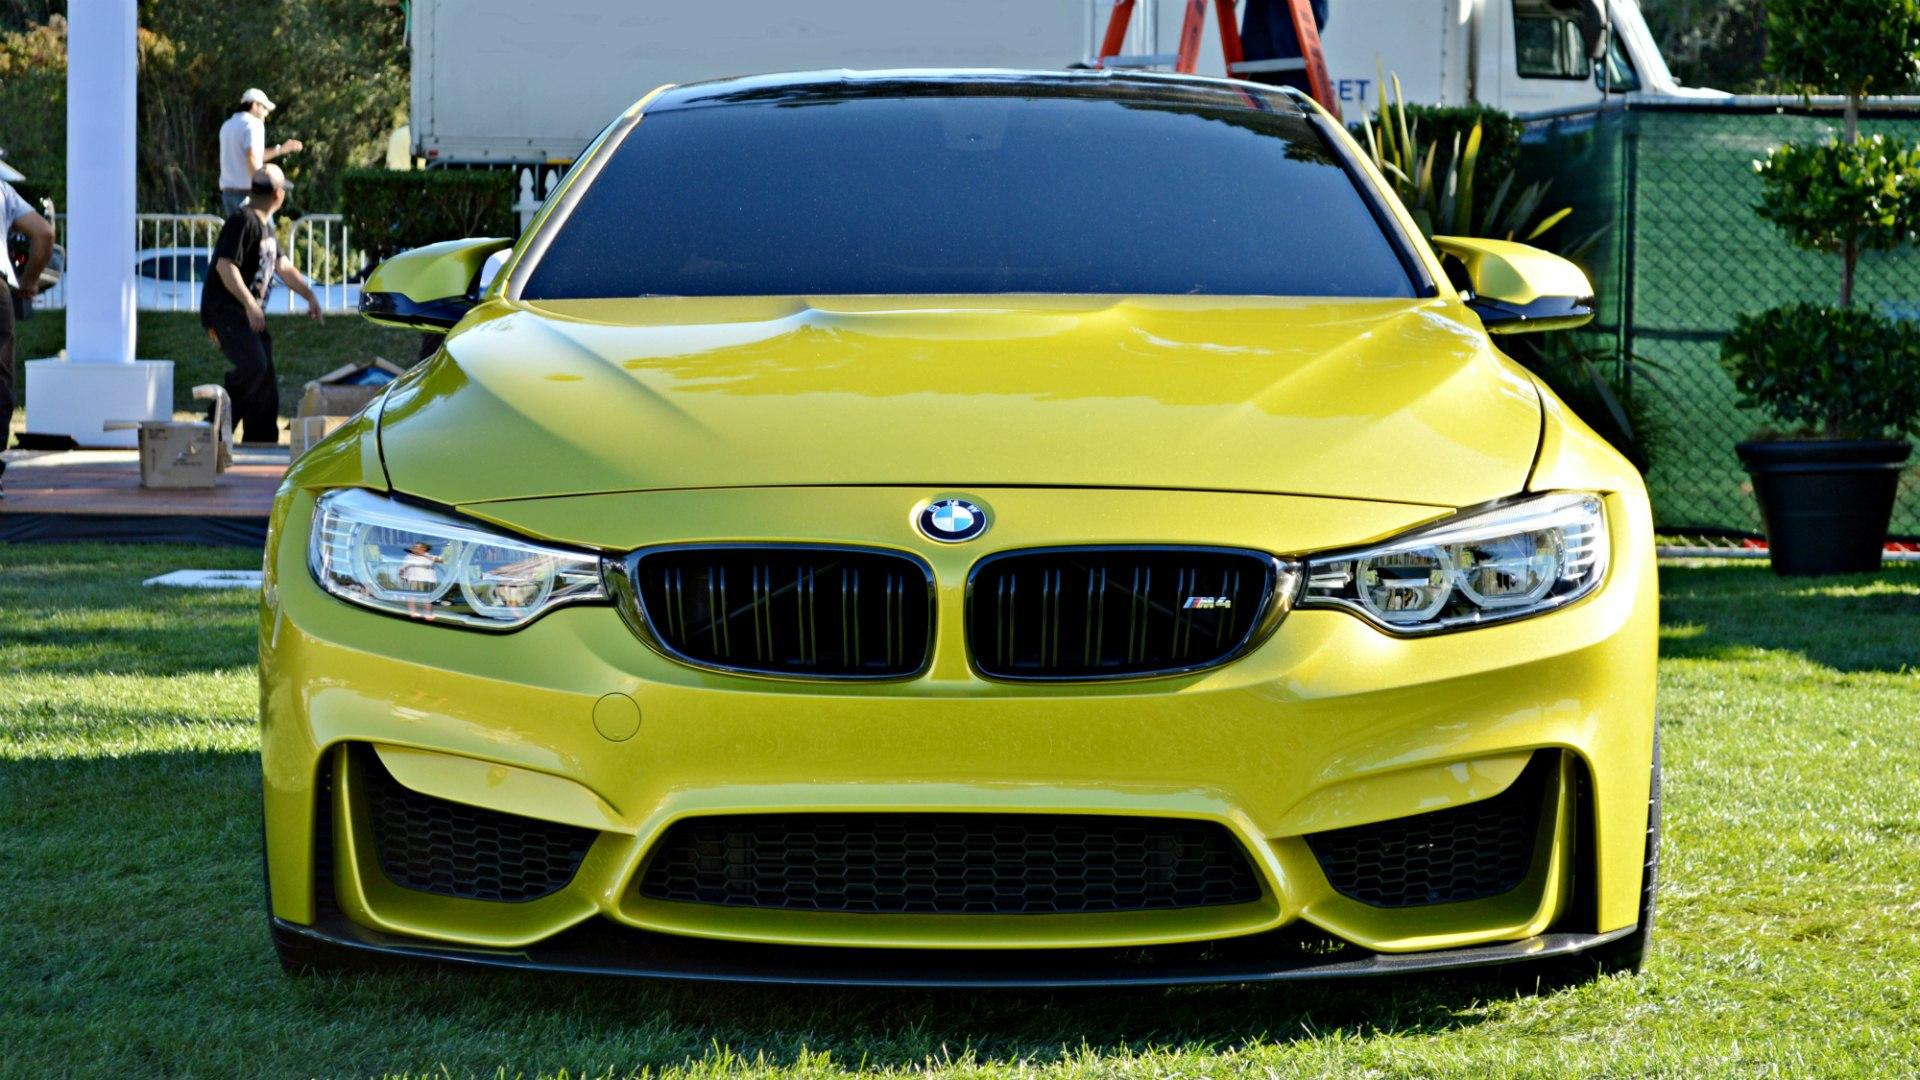 yellow car 2015 09 - photo #32